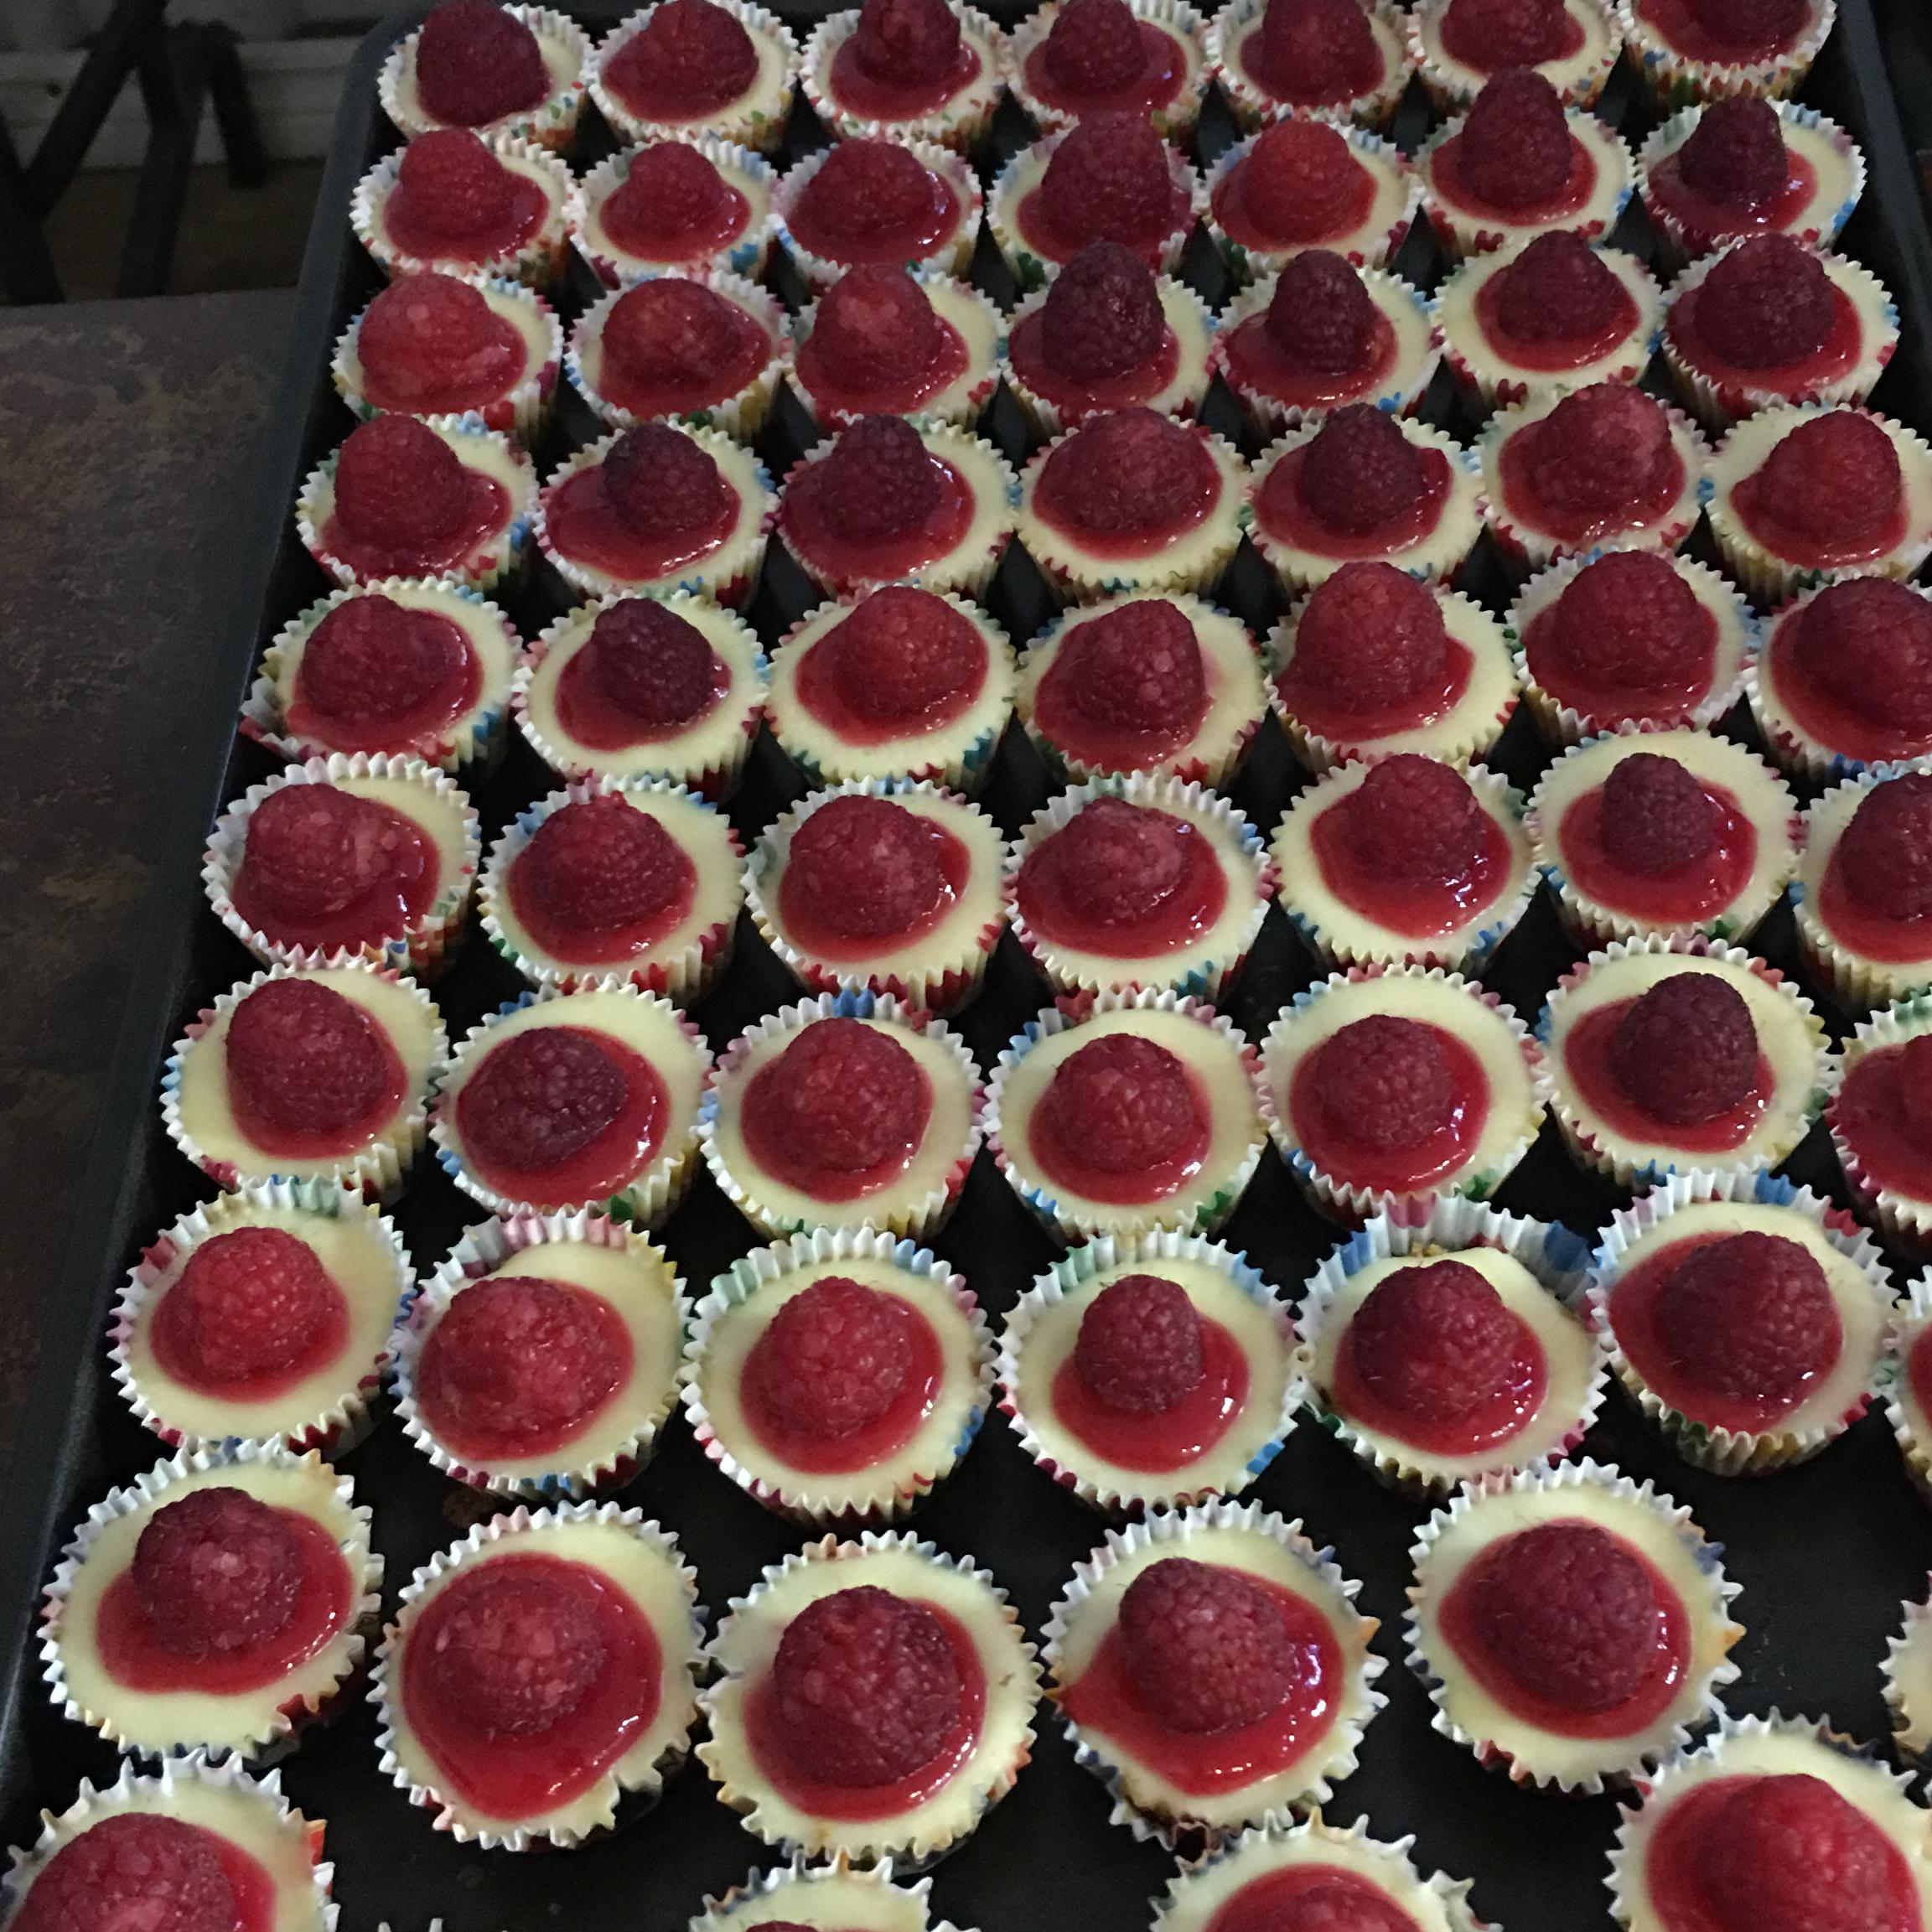 Mini Cheesecakes with Vanilla Wafers atlchef